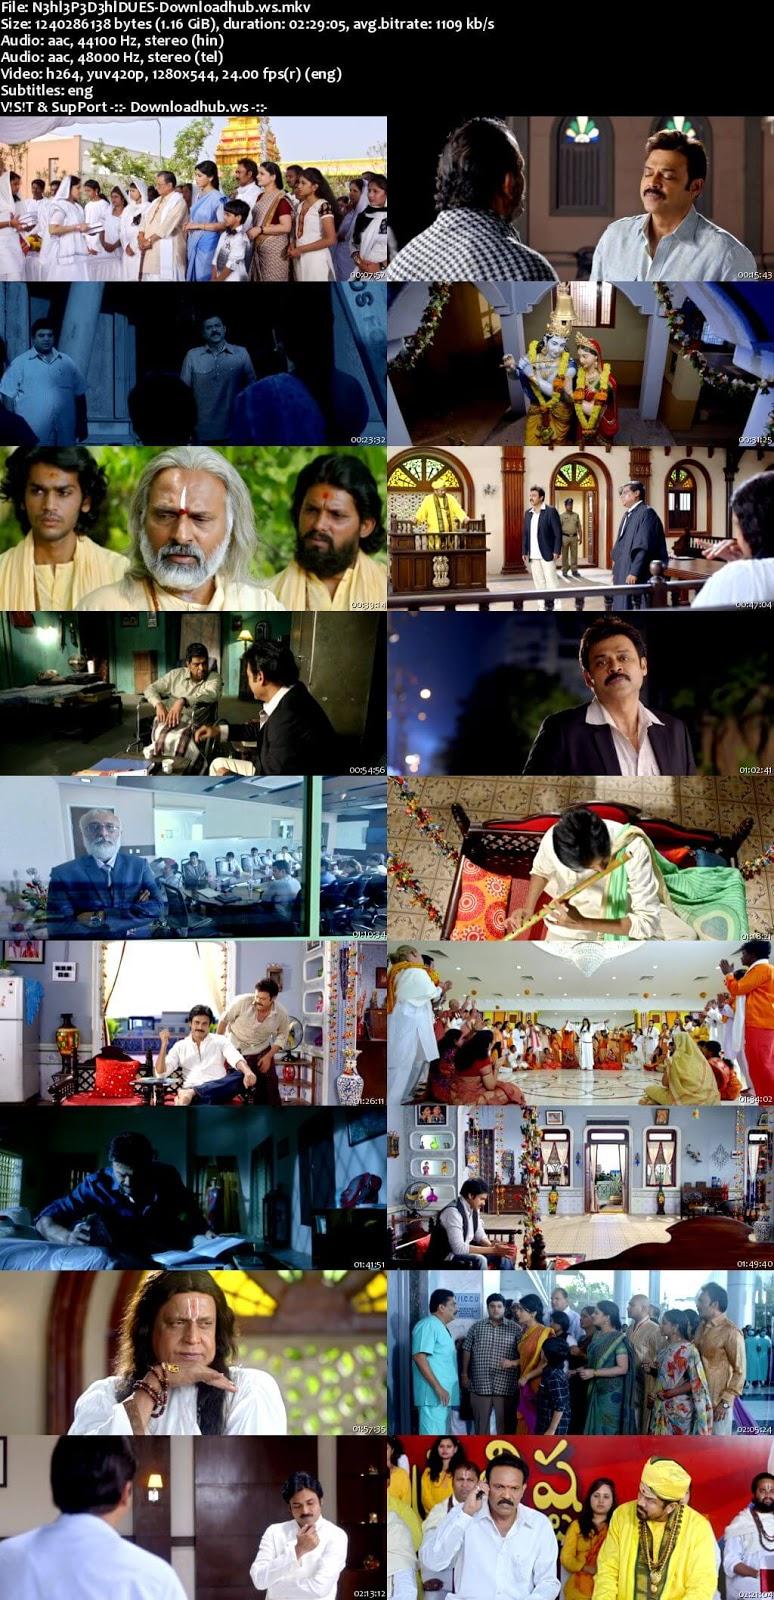 Nehle Pe Dehla 2018 UNCUT Hindi Dual Audio 720p HDRip Download